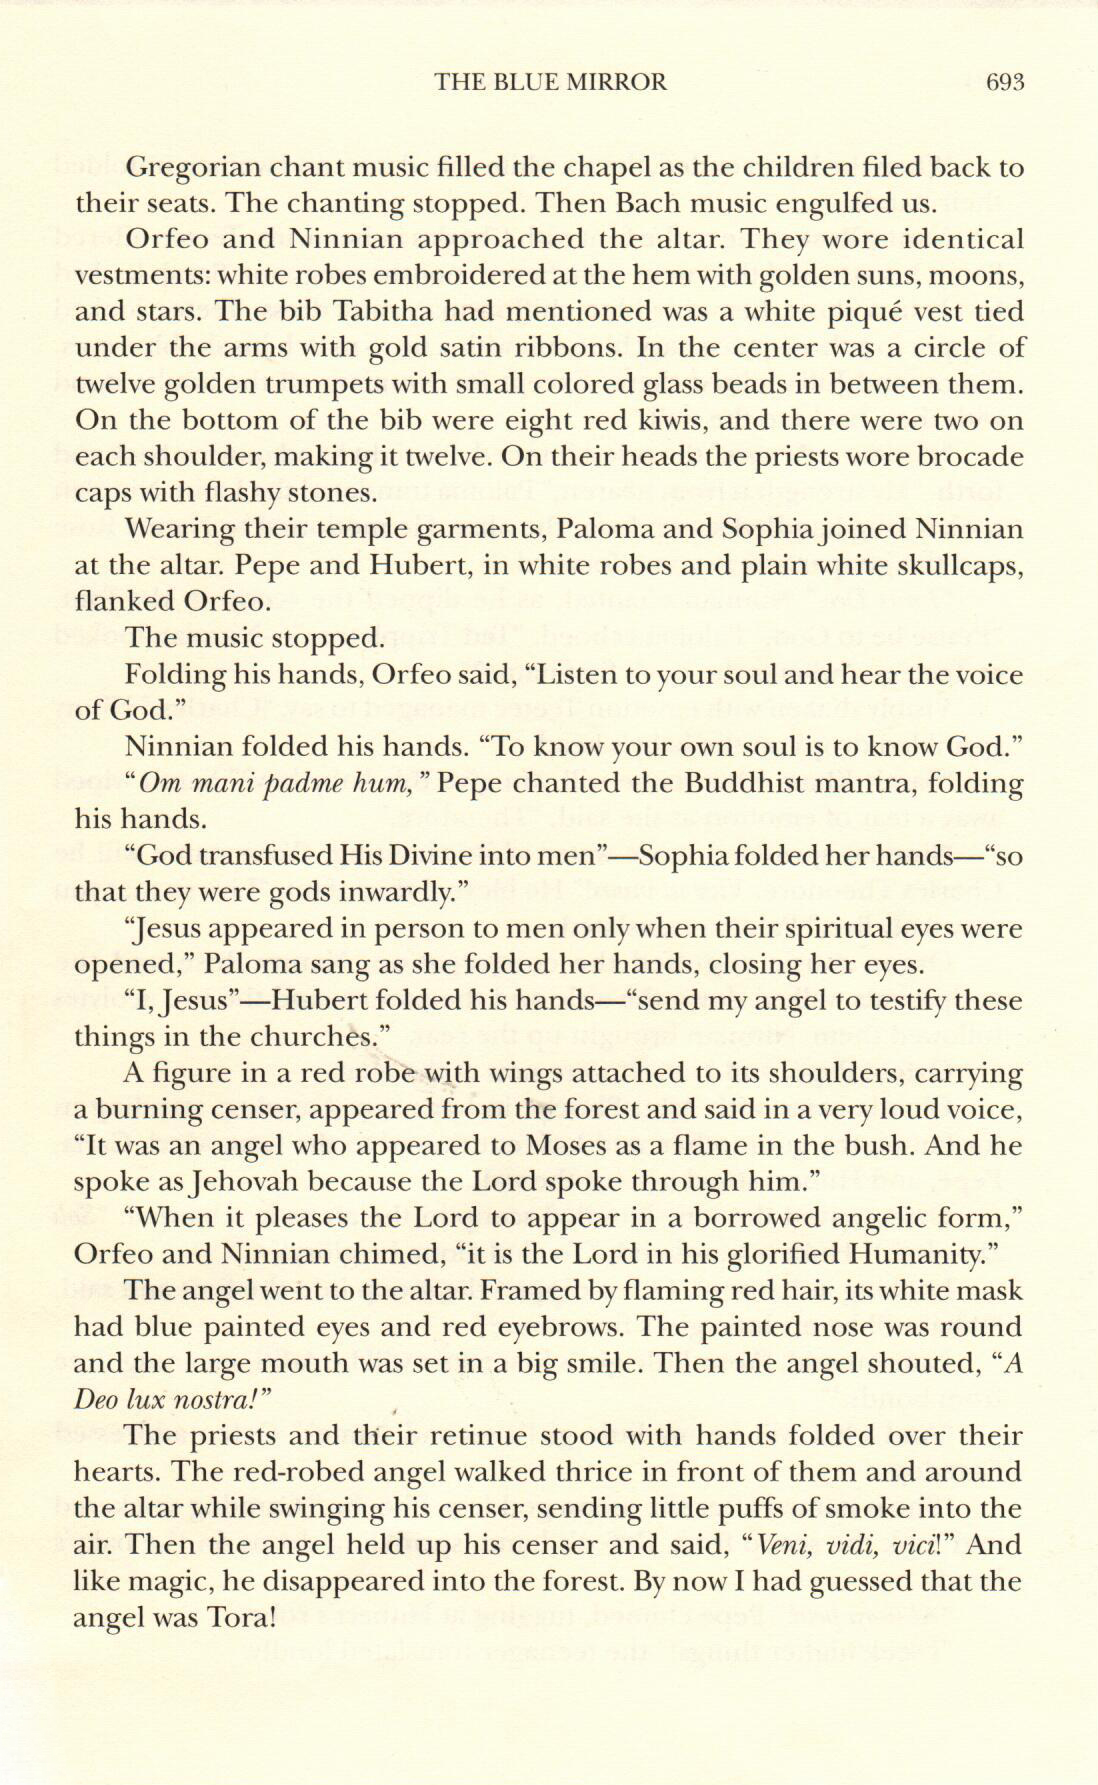 page_693_TBM